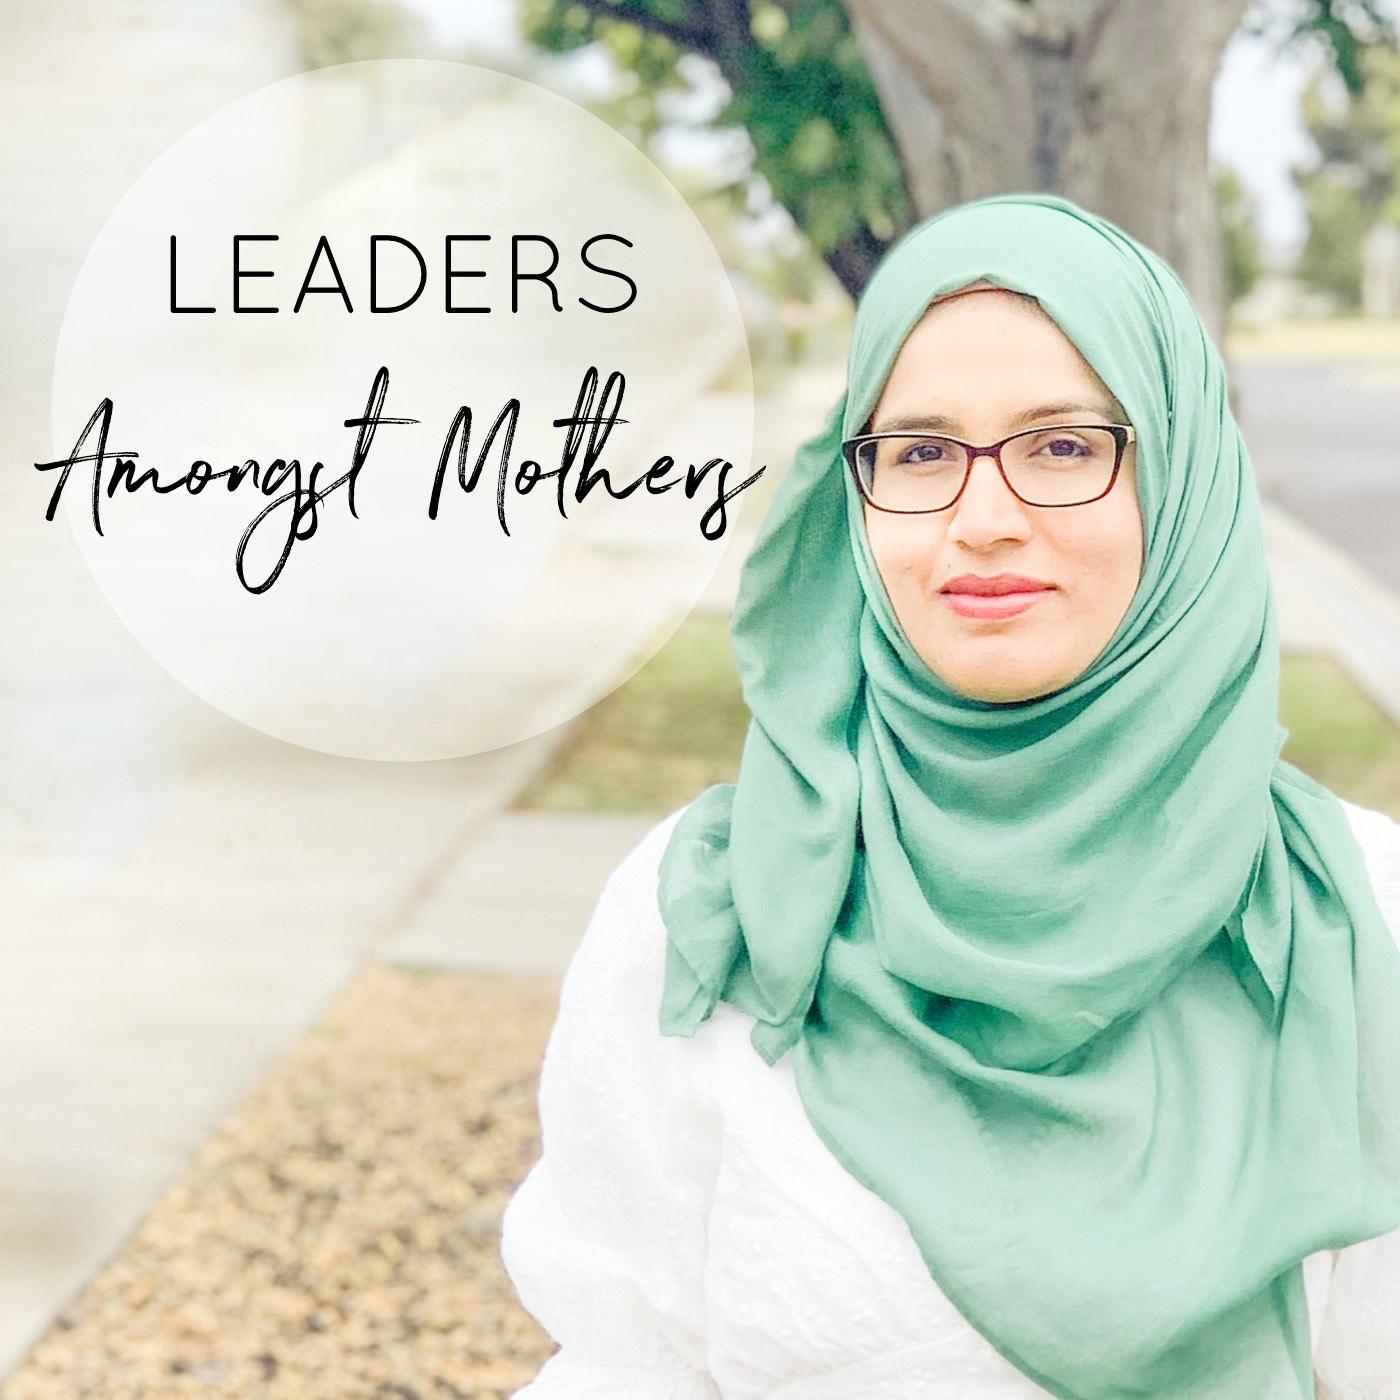 Leaders Amongst Mothers